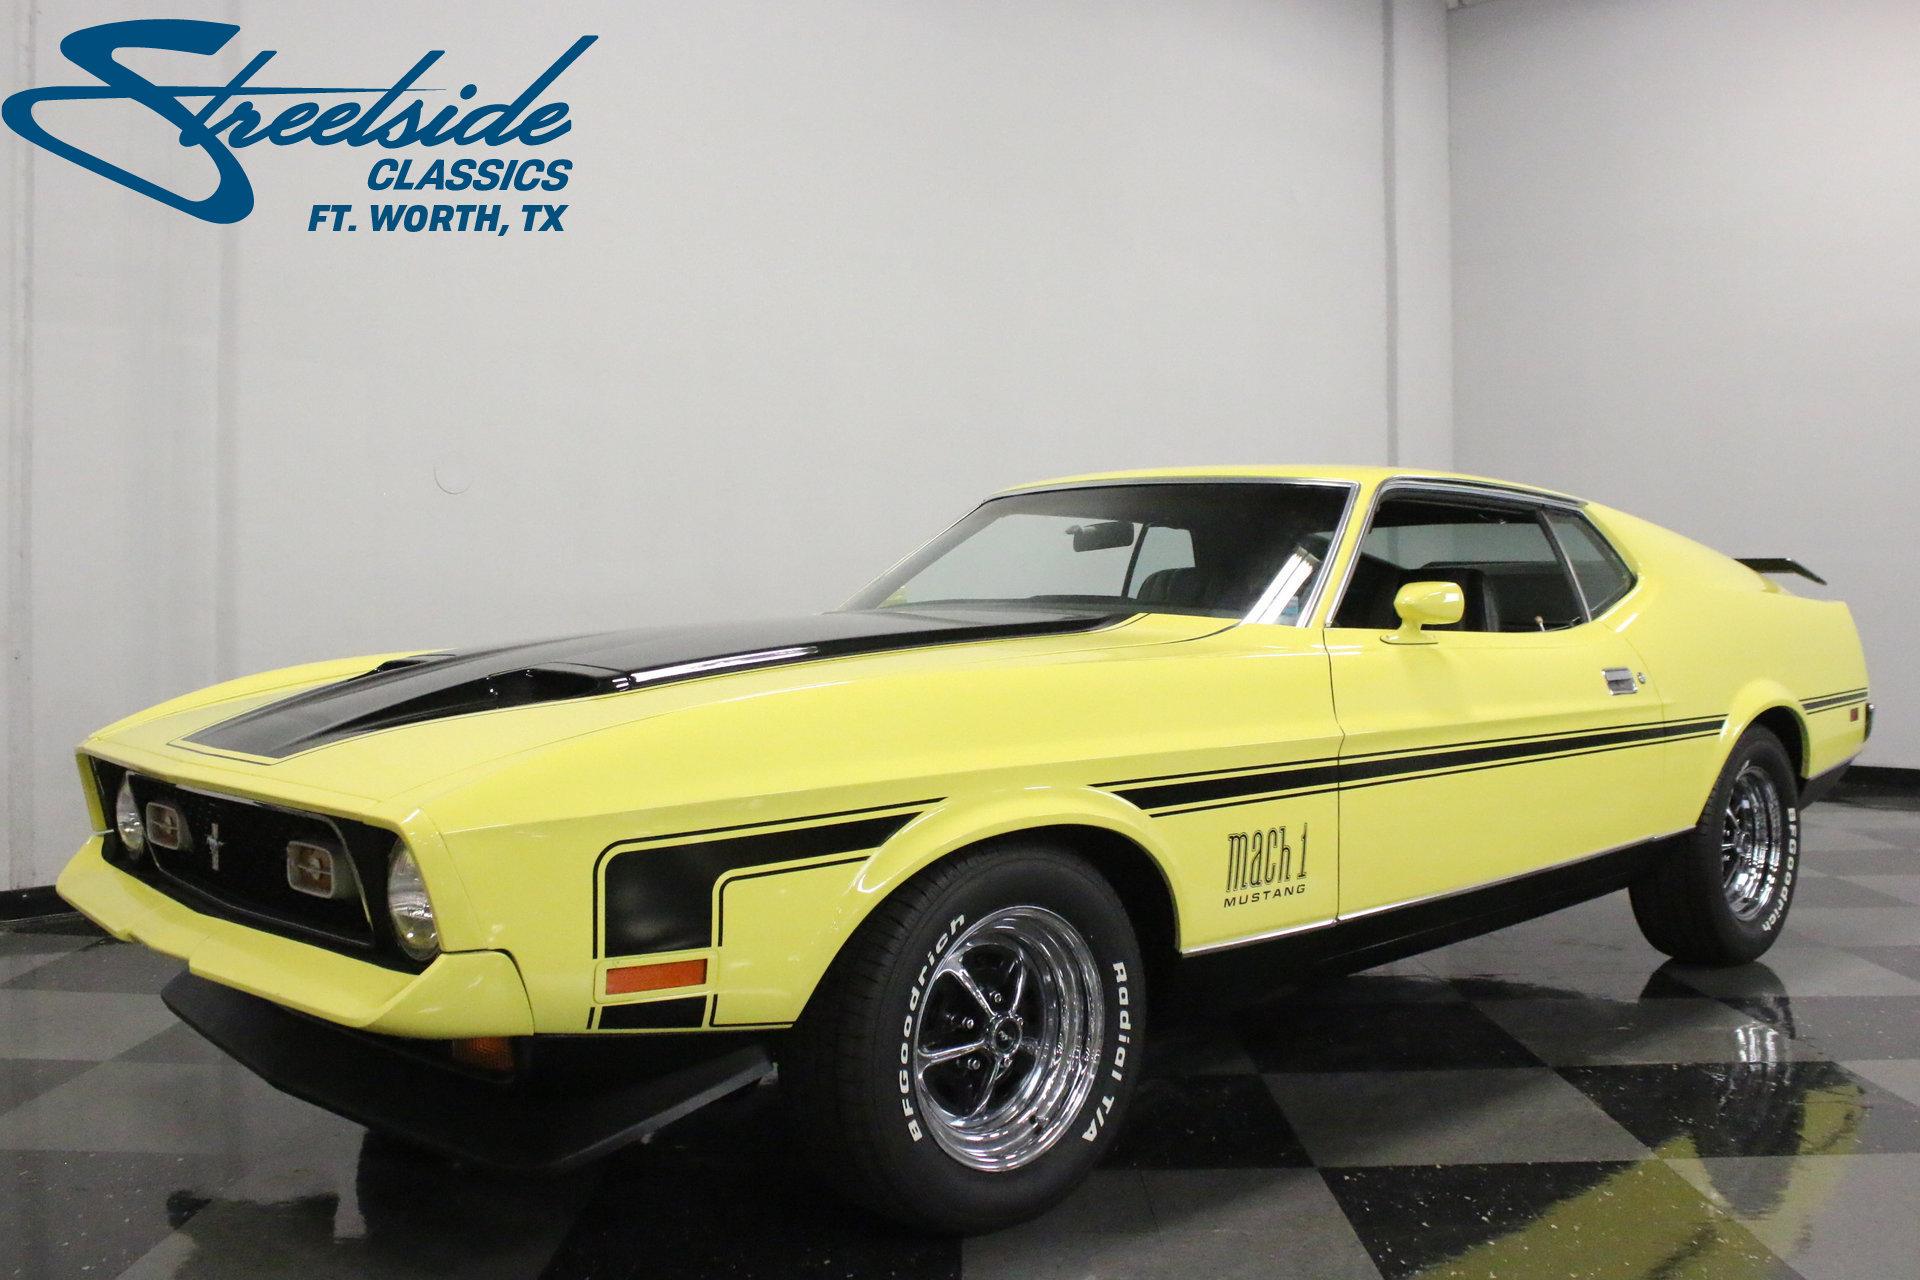 Unusual Streetside Classics Dallas Tx Ideas - Classic Cars Ideas ...